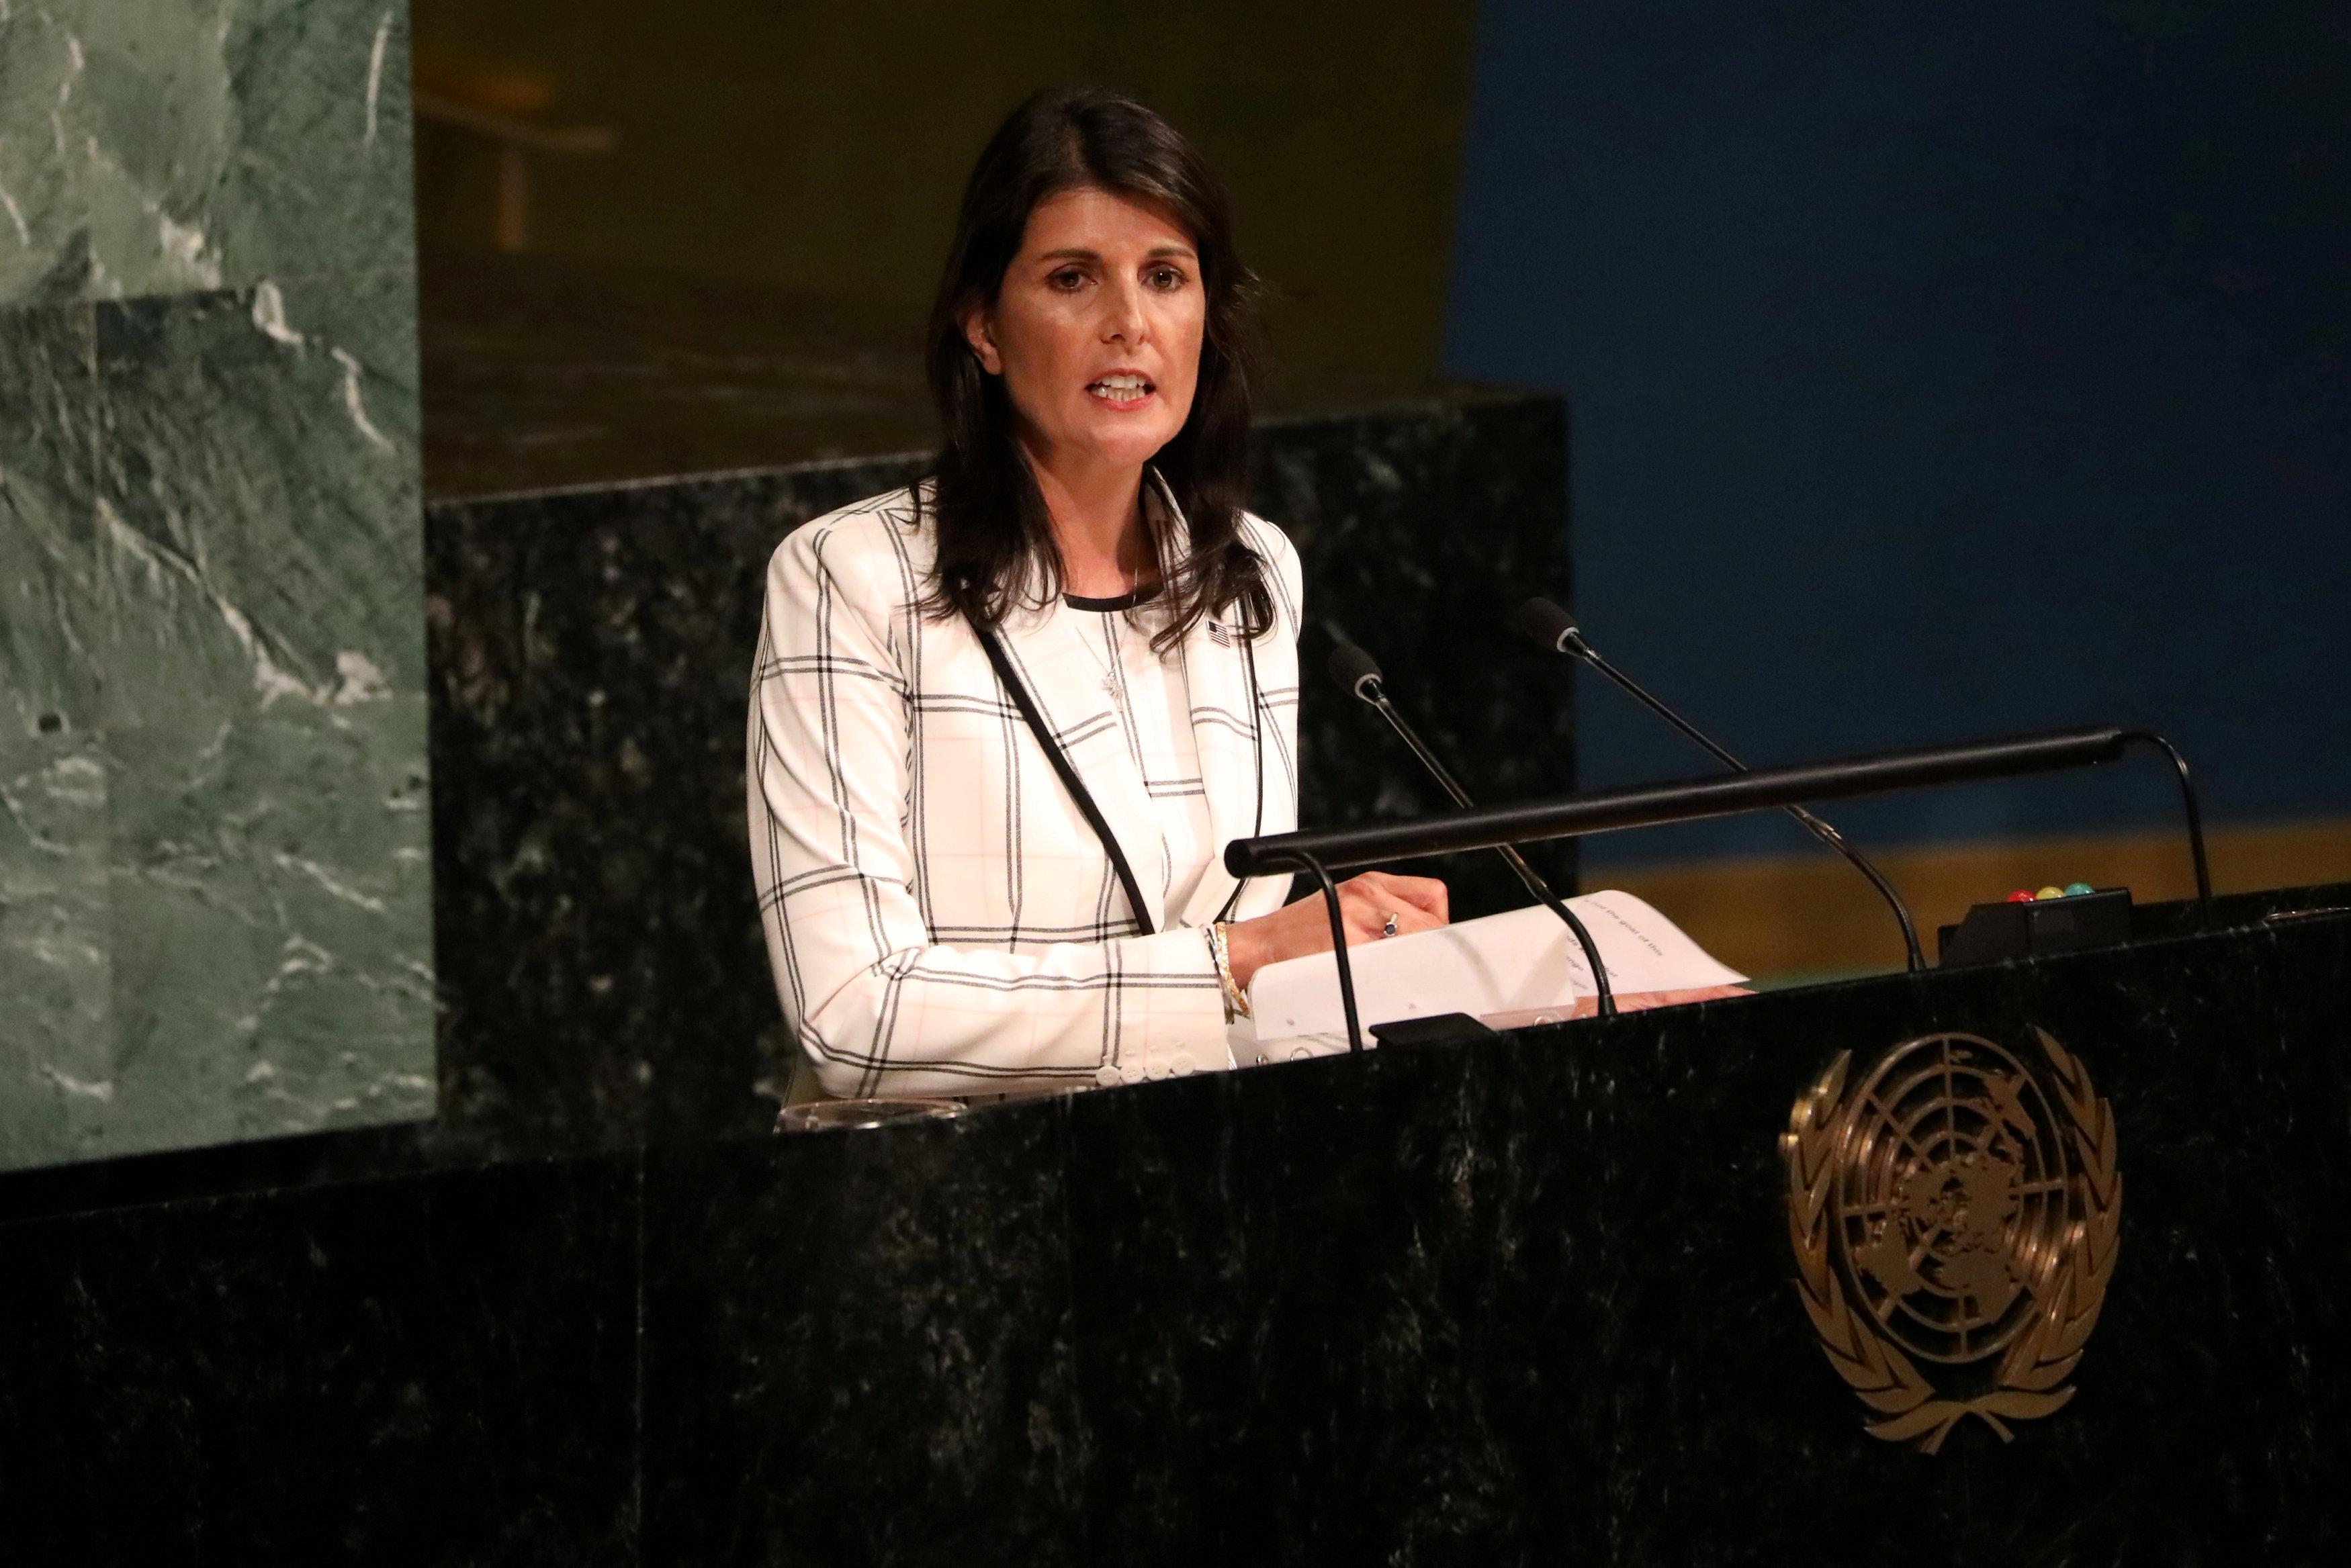 Trump's U.N. envoy: 'Every day I feel like I put body armor on'